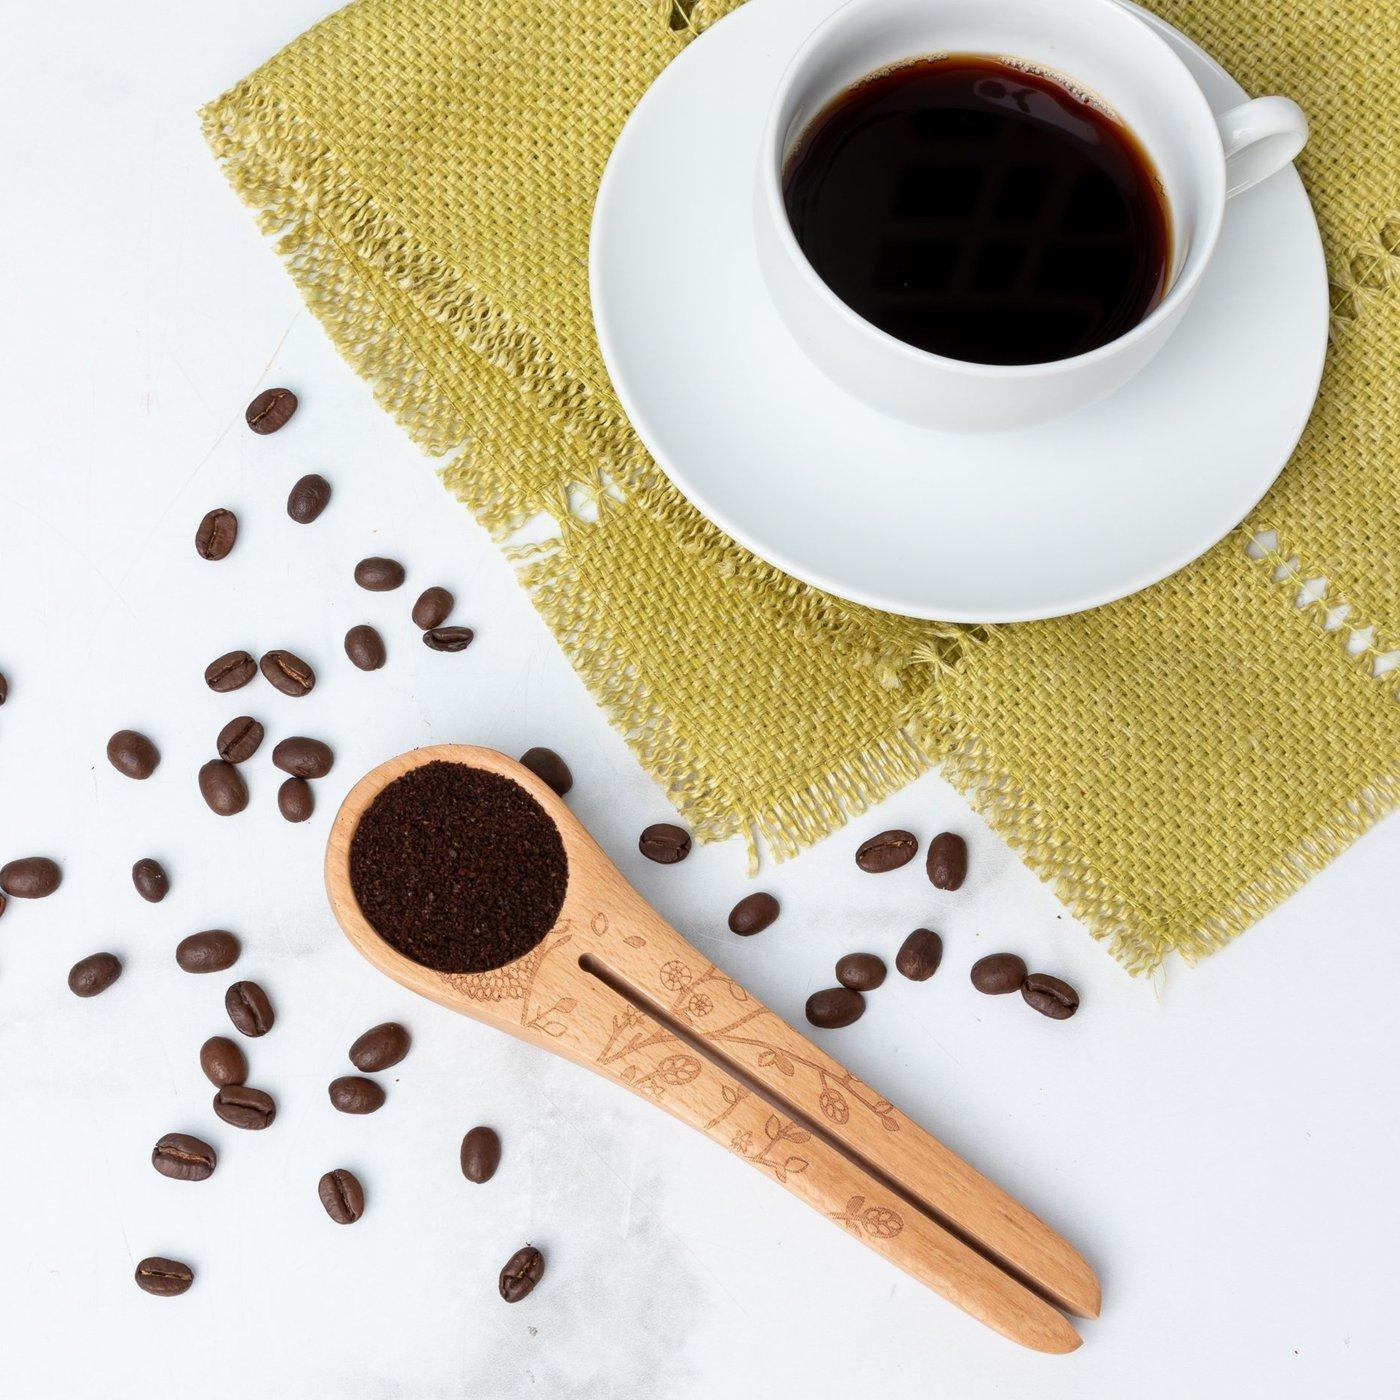 Woodland Hedgehog Coffee Scoop in action